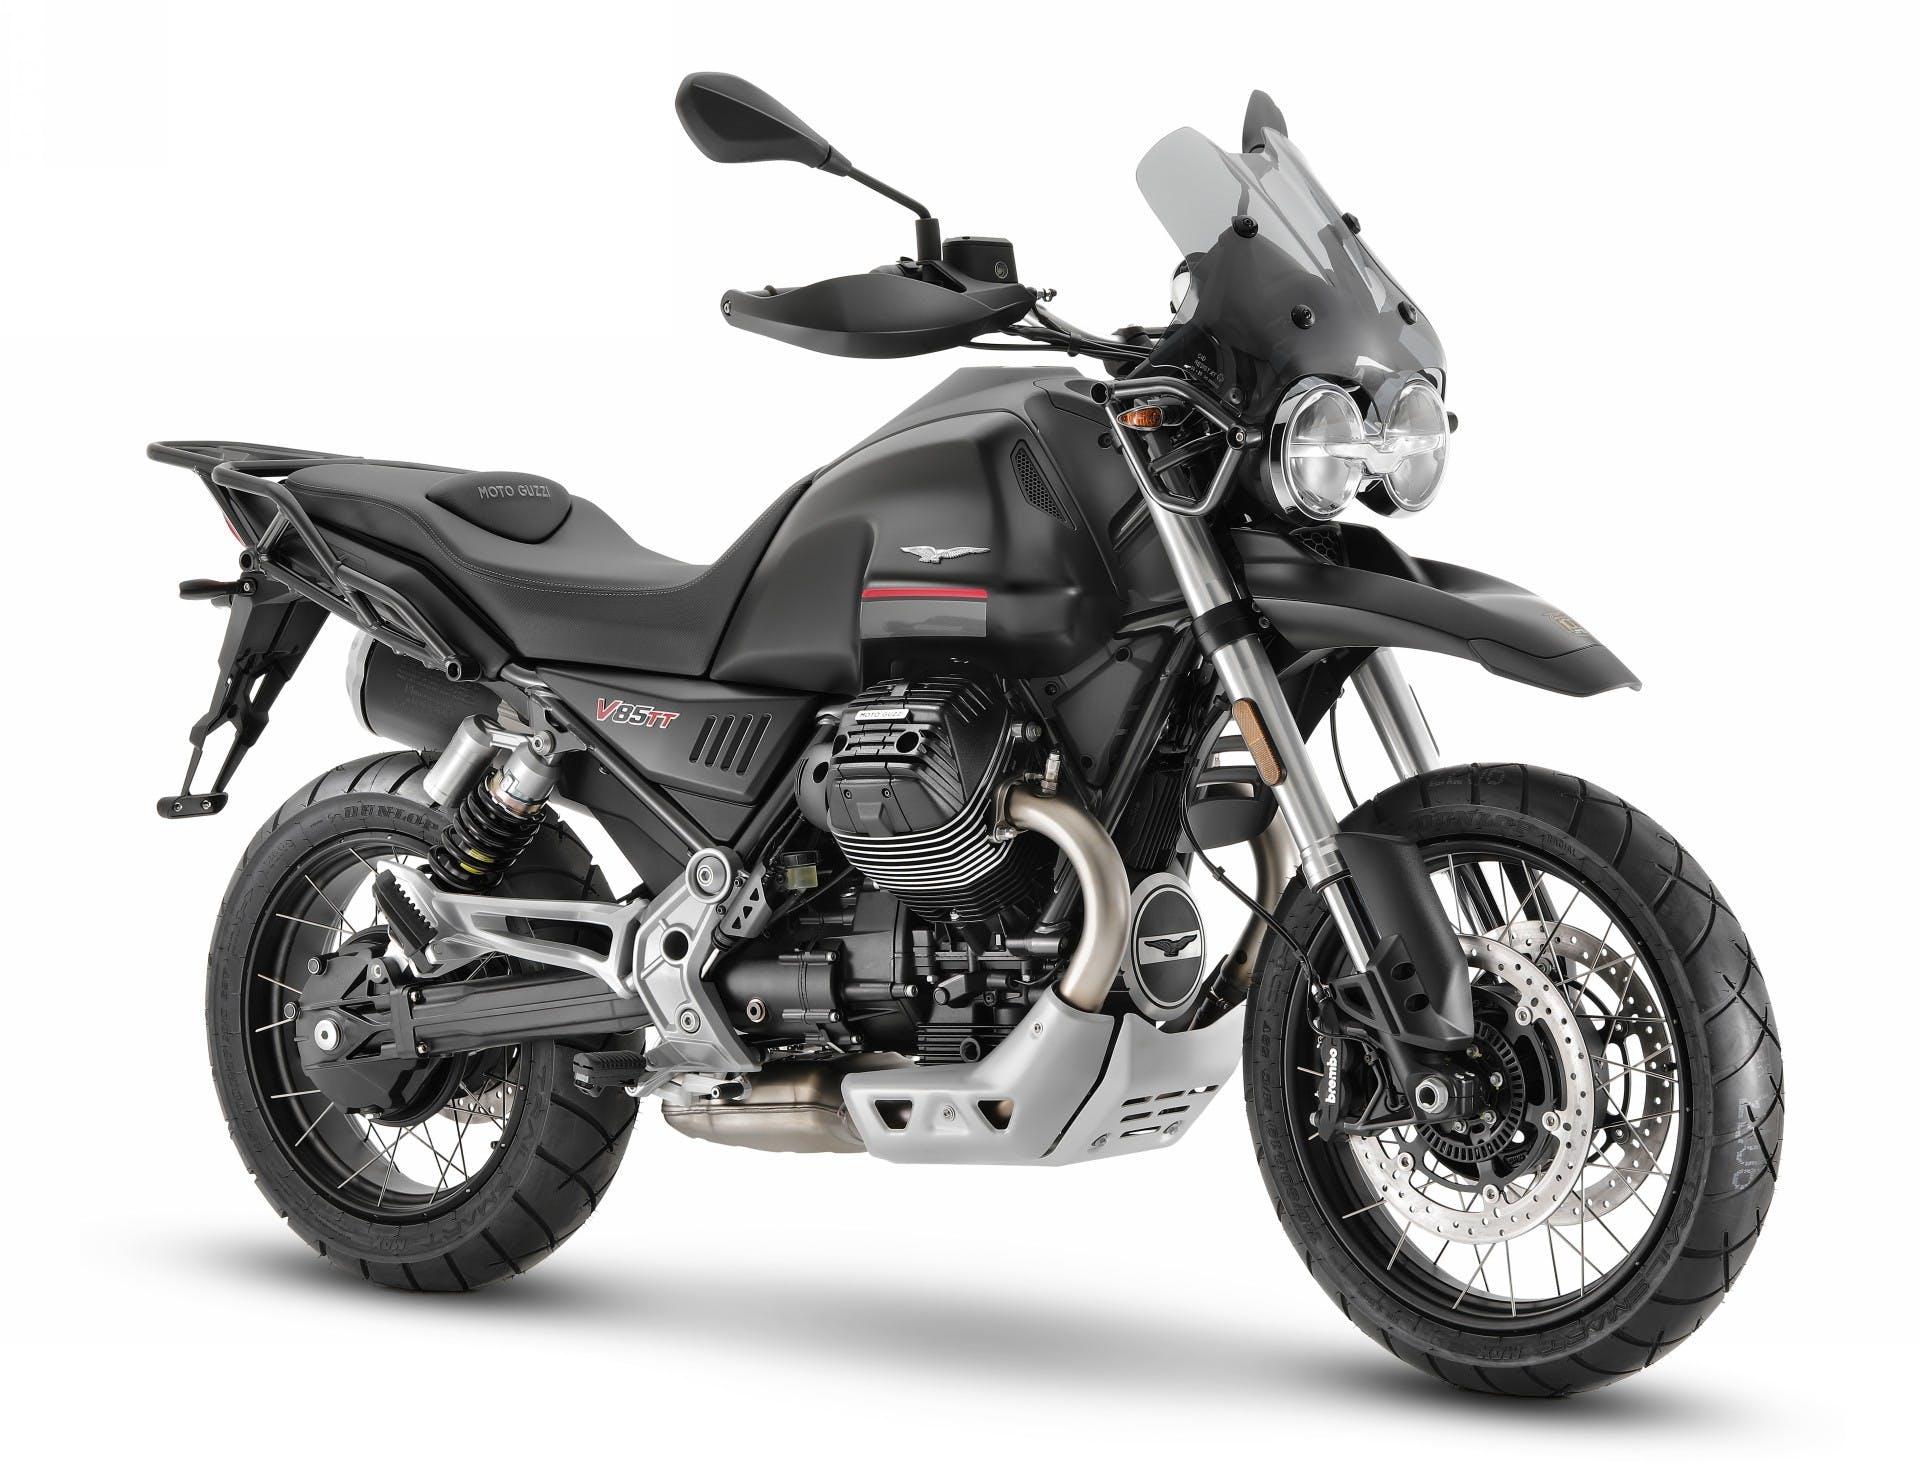 Moto Guzzi V85 TT foto in studio vista laterale tre quarti